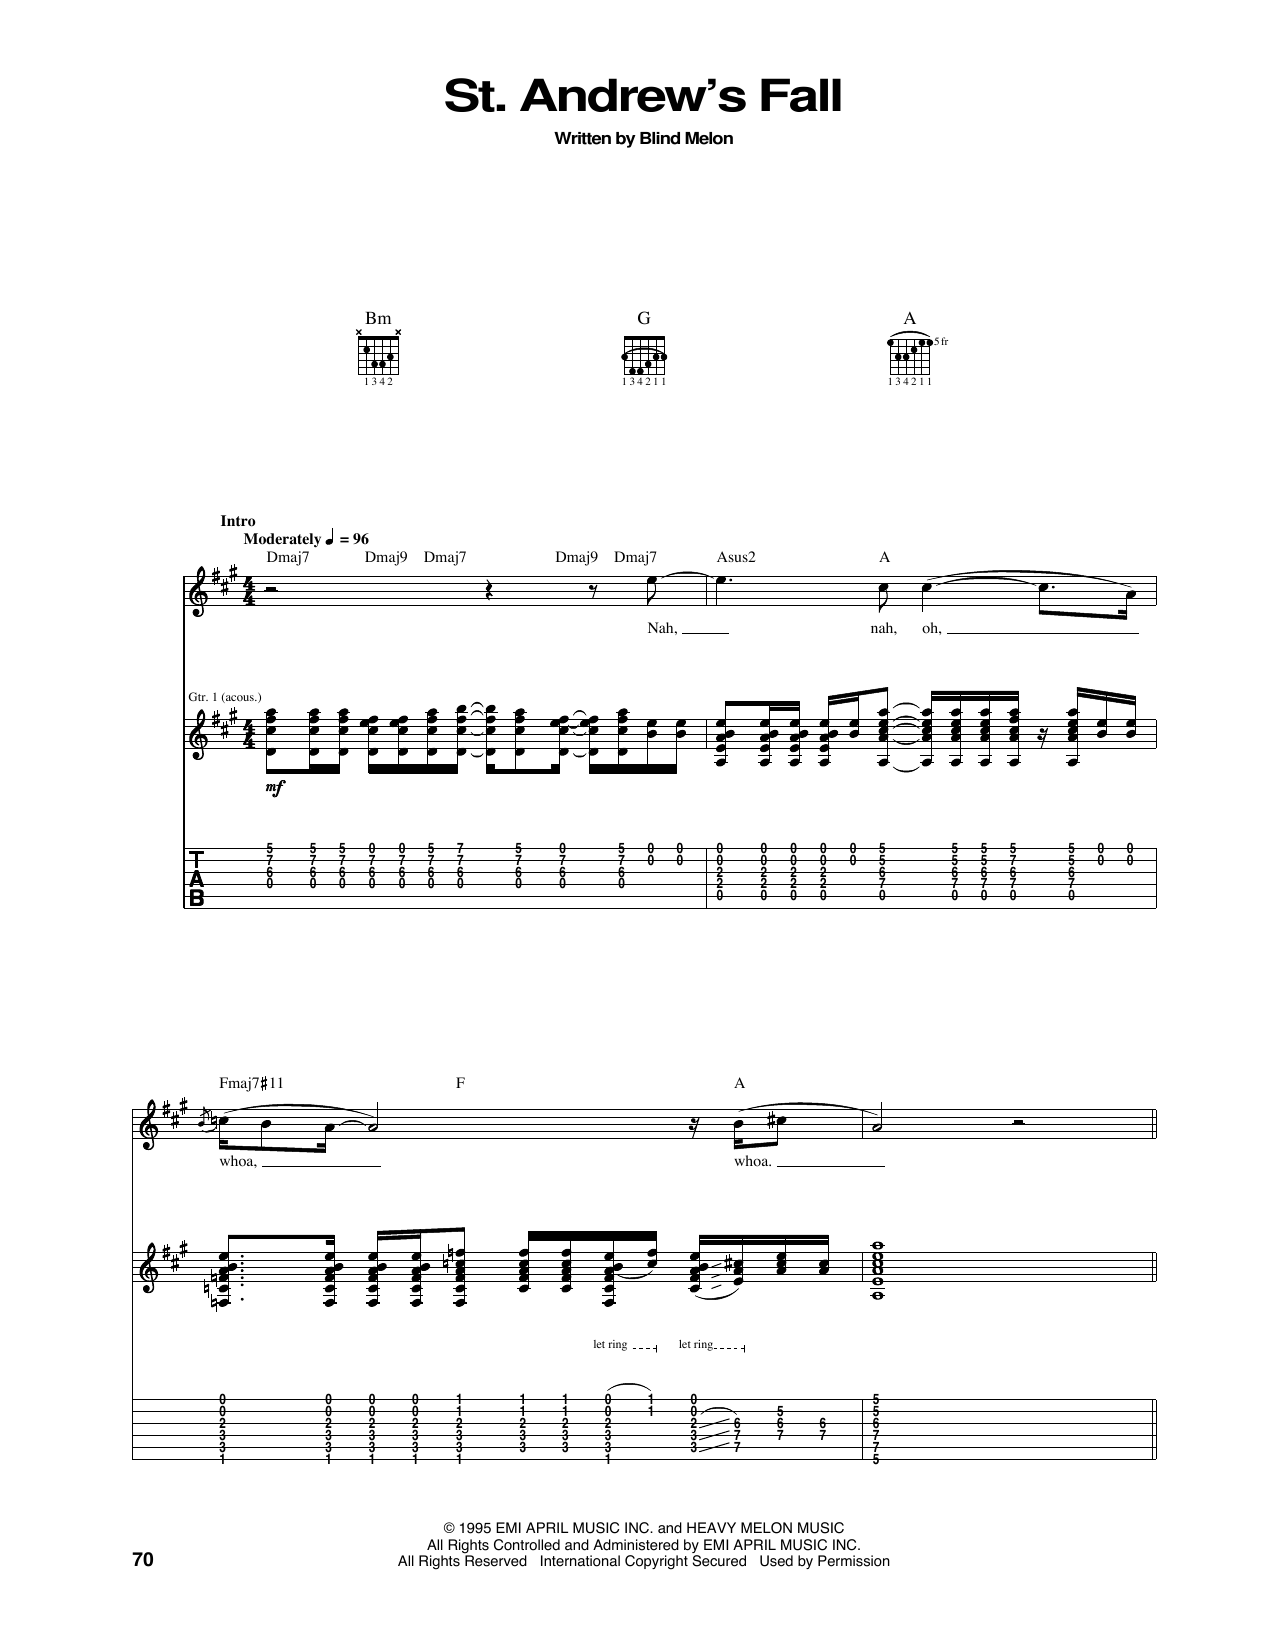 St. Andrew's Fall Sheet Music